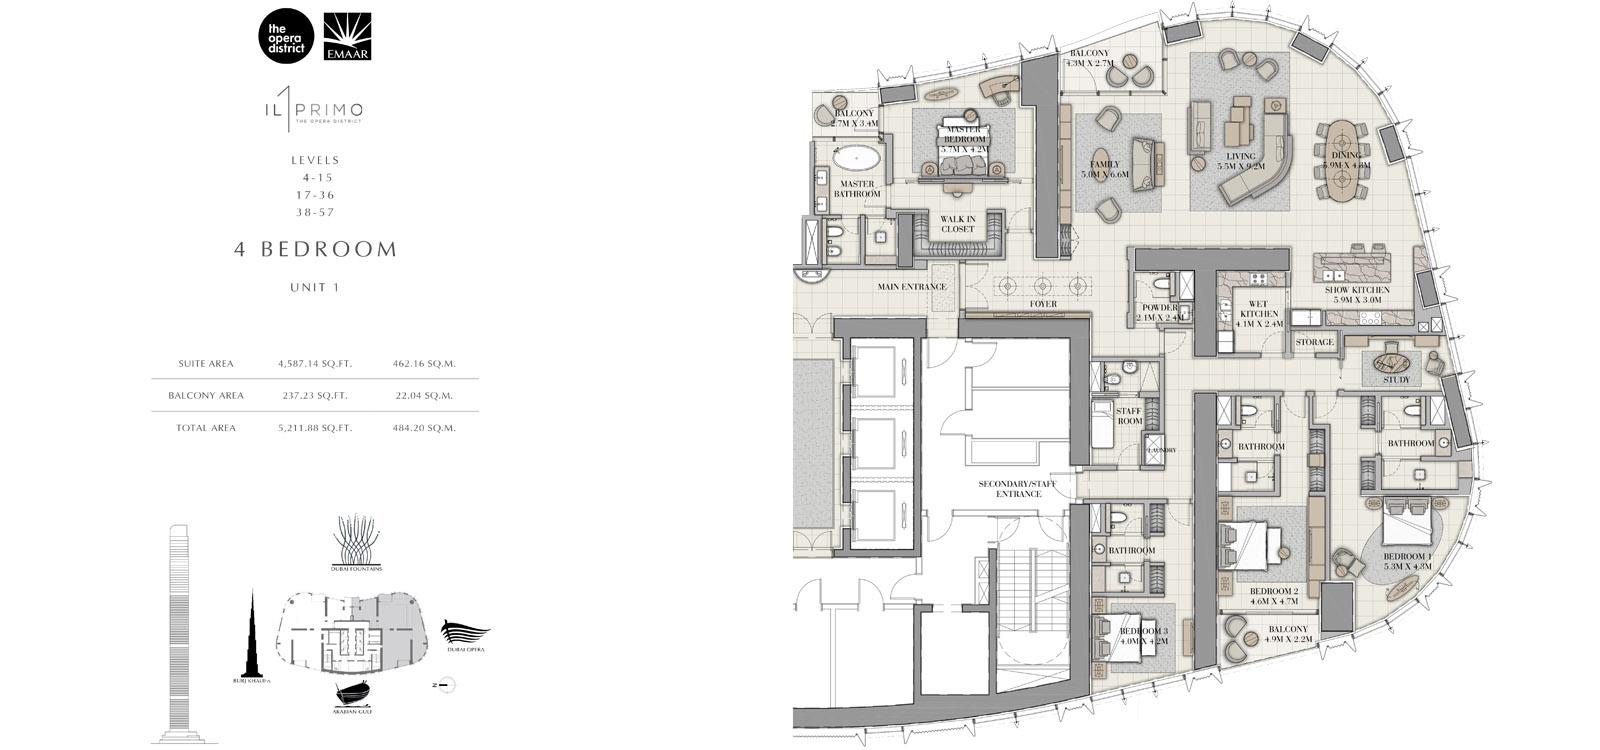 Il Primo Apartments at the Opera District